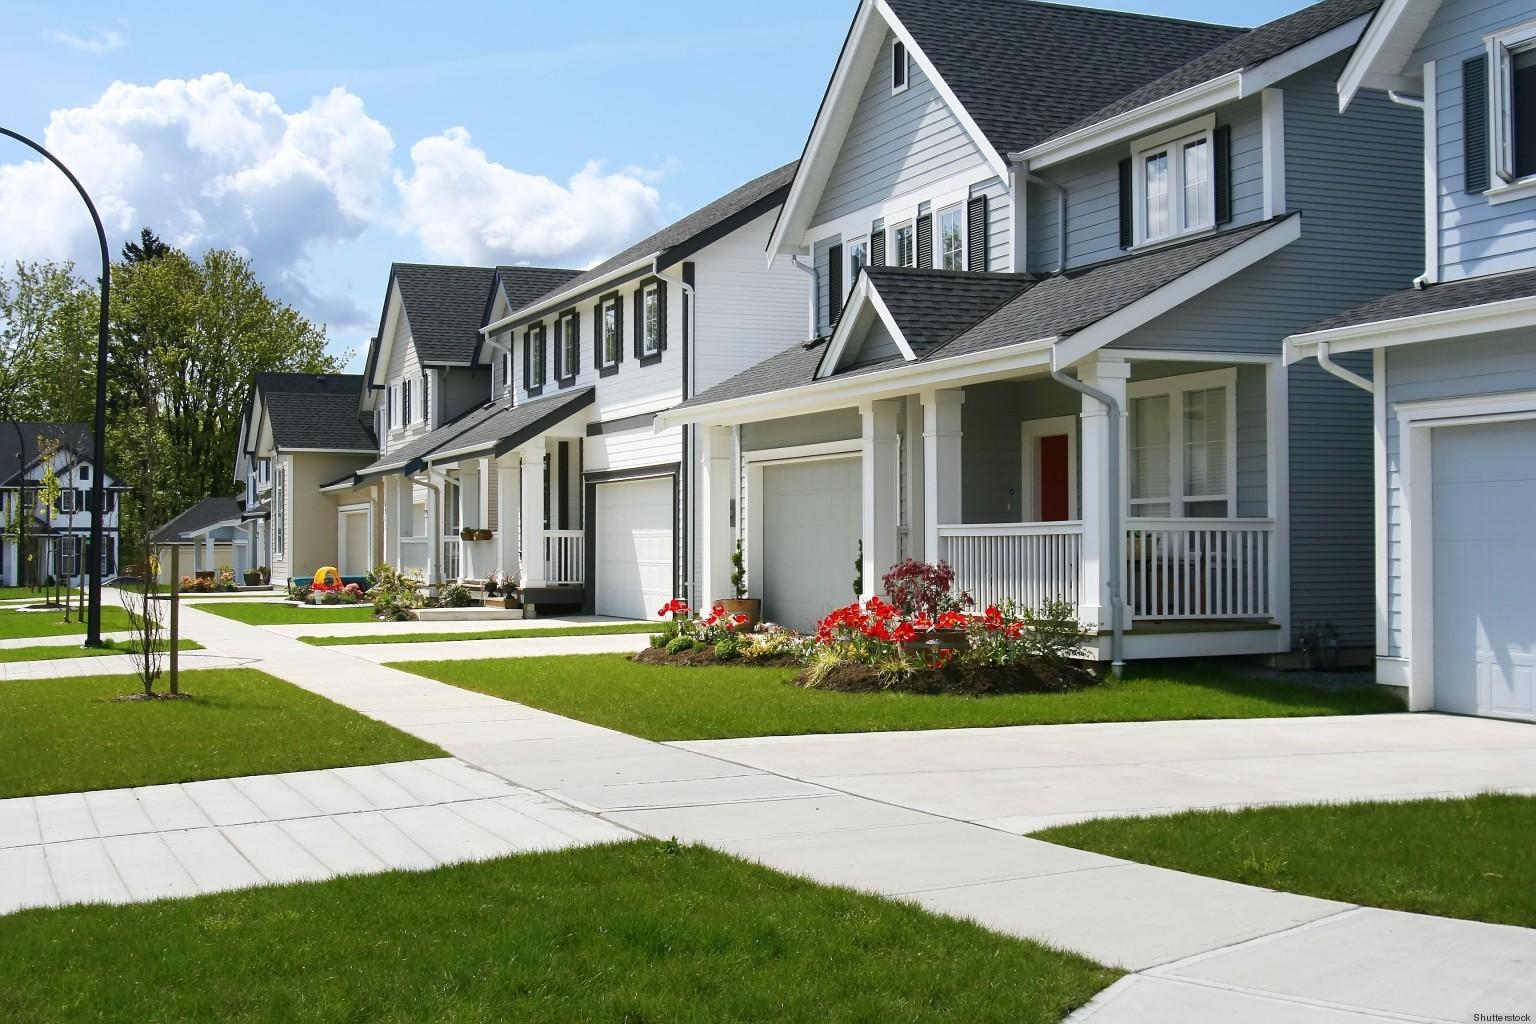 miranda lambert and blake shelton named most desirable celebrity neighbors by zillow survey 2013. Black Bedroom Furniture Sets. Home Design Ideas